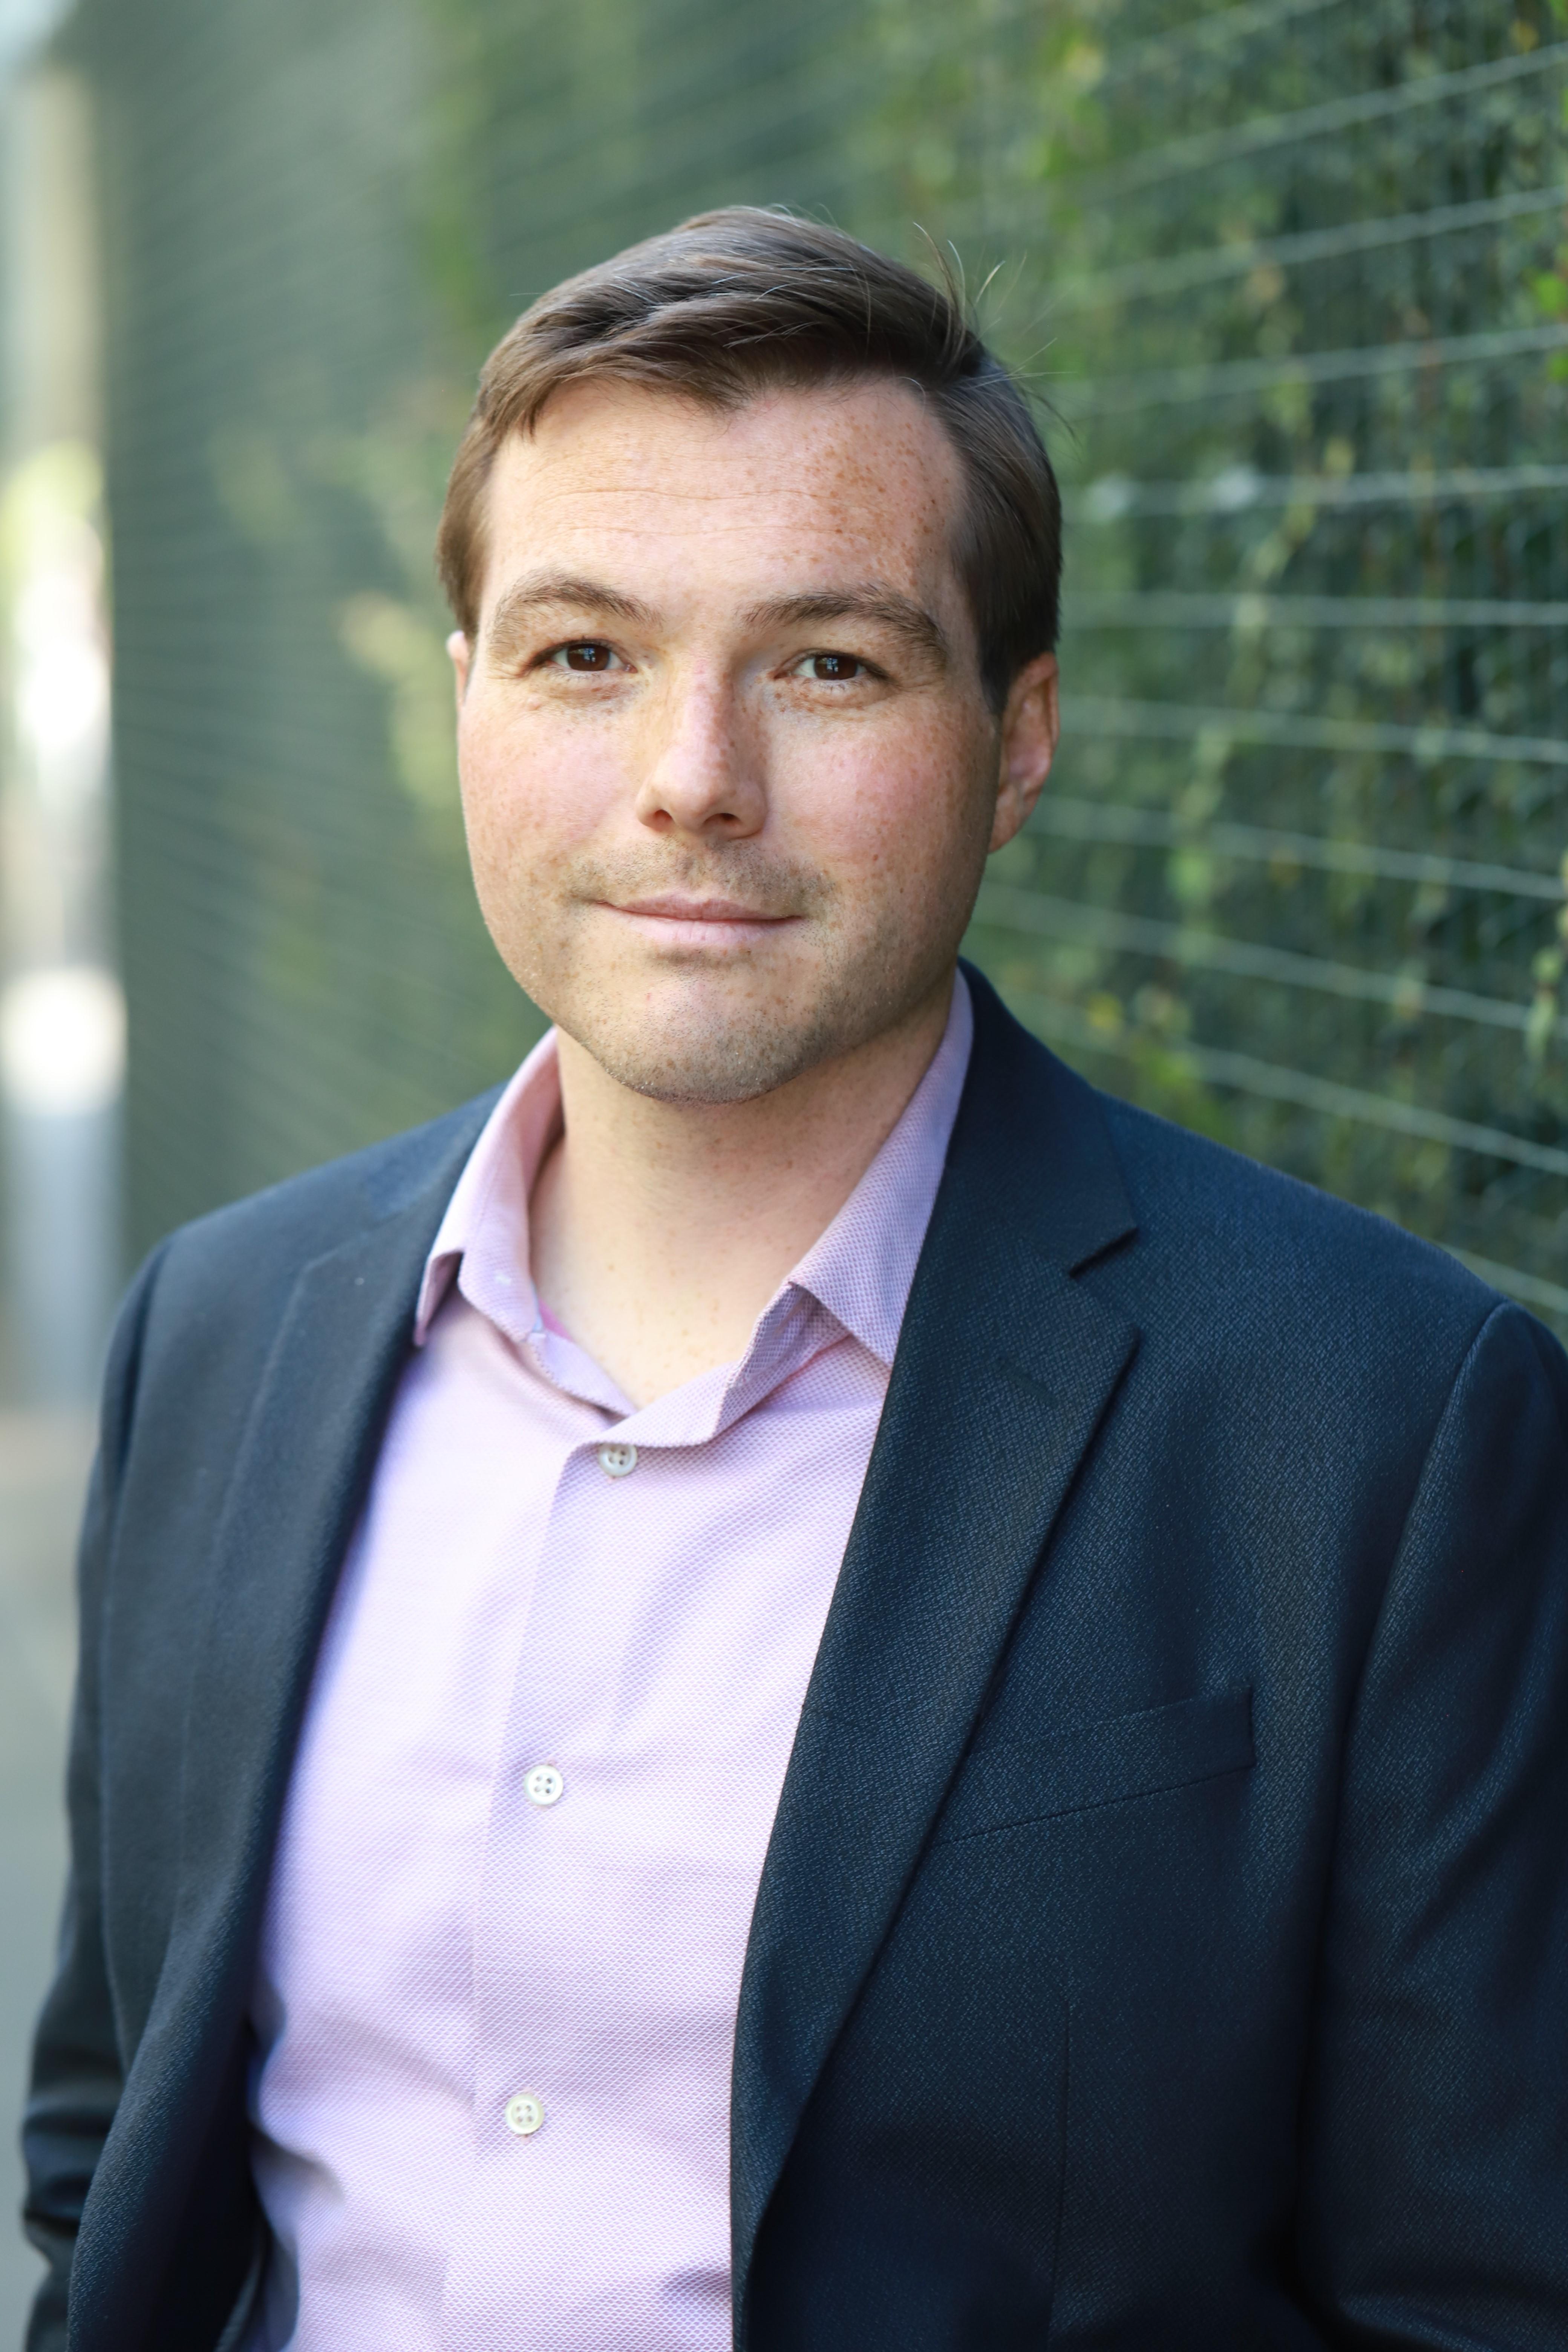 Daniel Tripp, Financial Planner, San Francisco, California